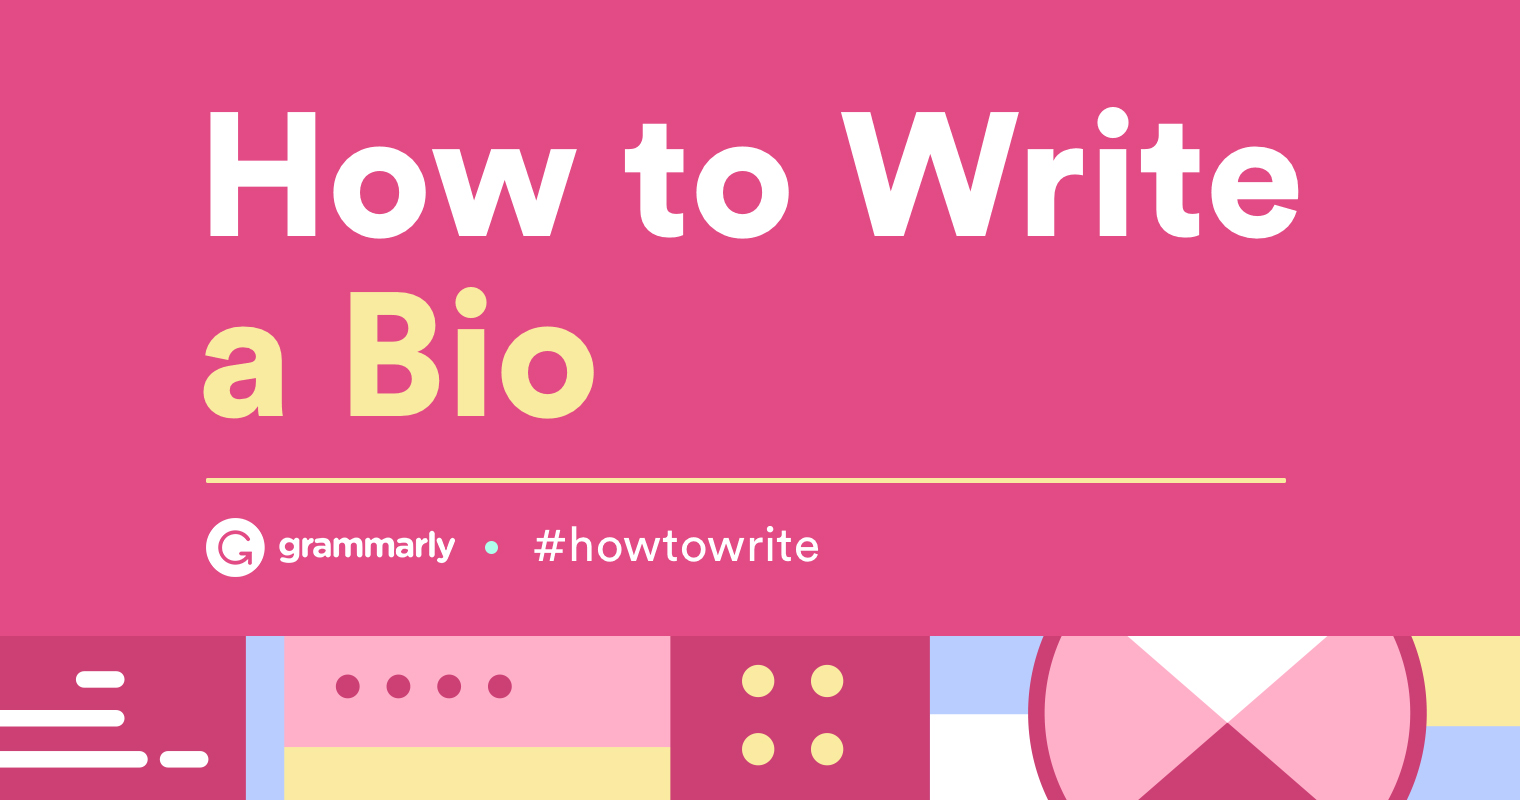 How can i make my essay shorter